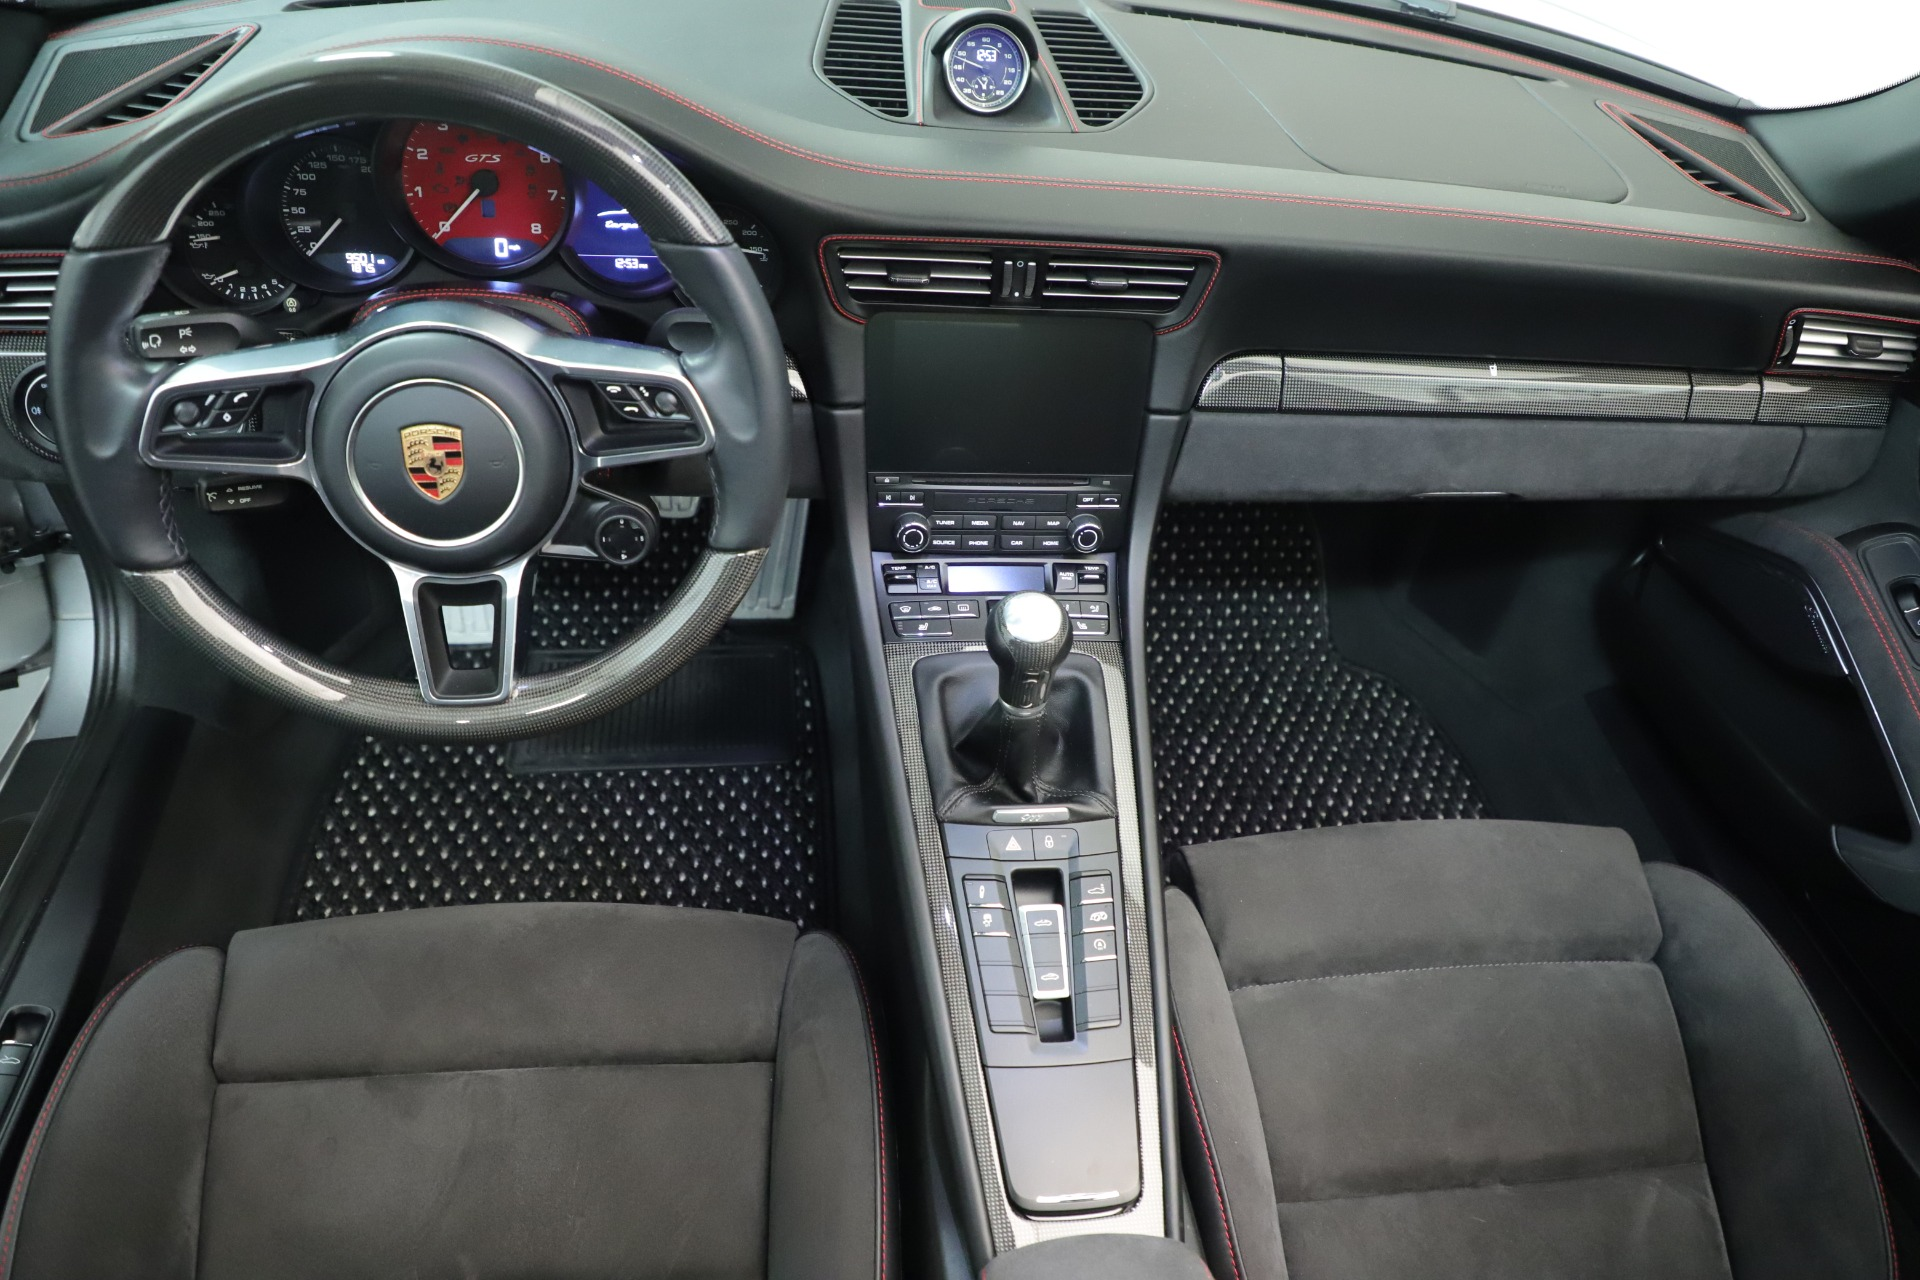 Used 2017 Porsche 911 Targa 4 GTS For Sale In Greenwich, CT 3374_p24